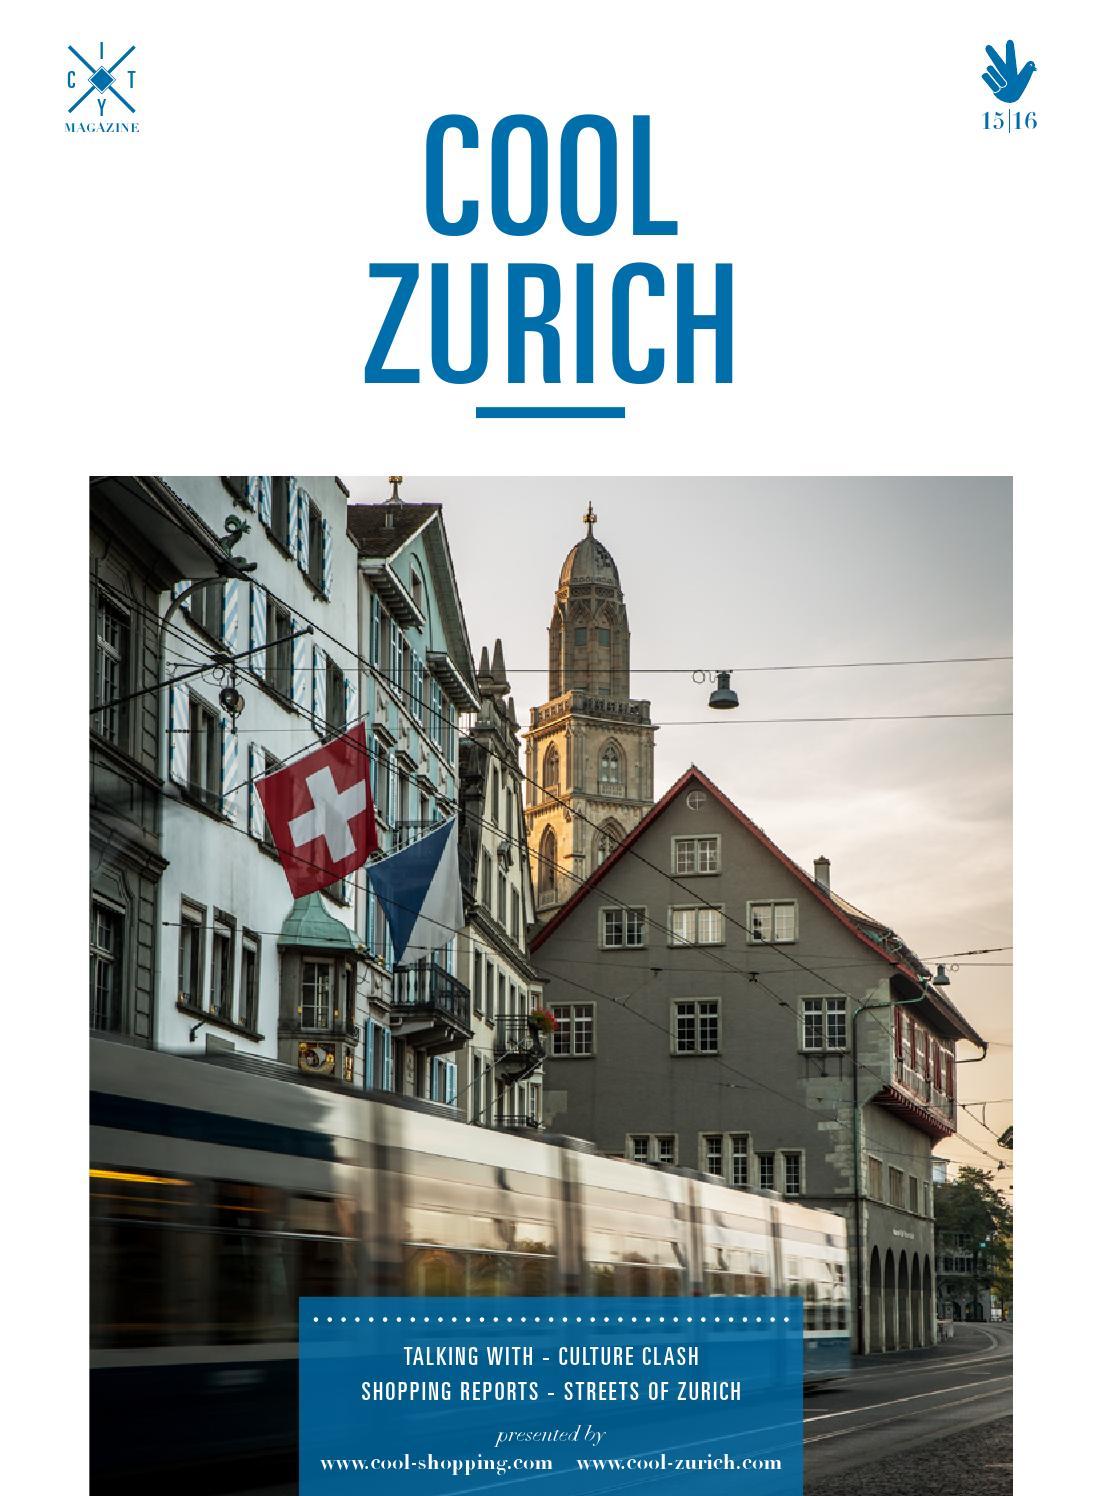 Wohnung mieten Zrich-Kreis 8 (Riesbach)   Locanto